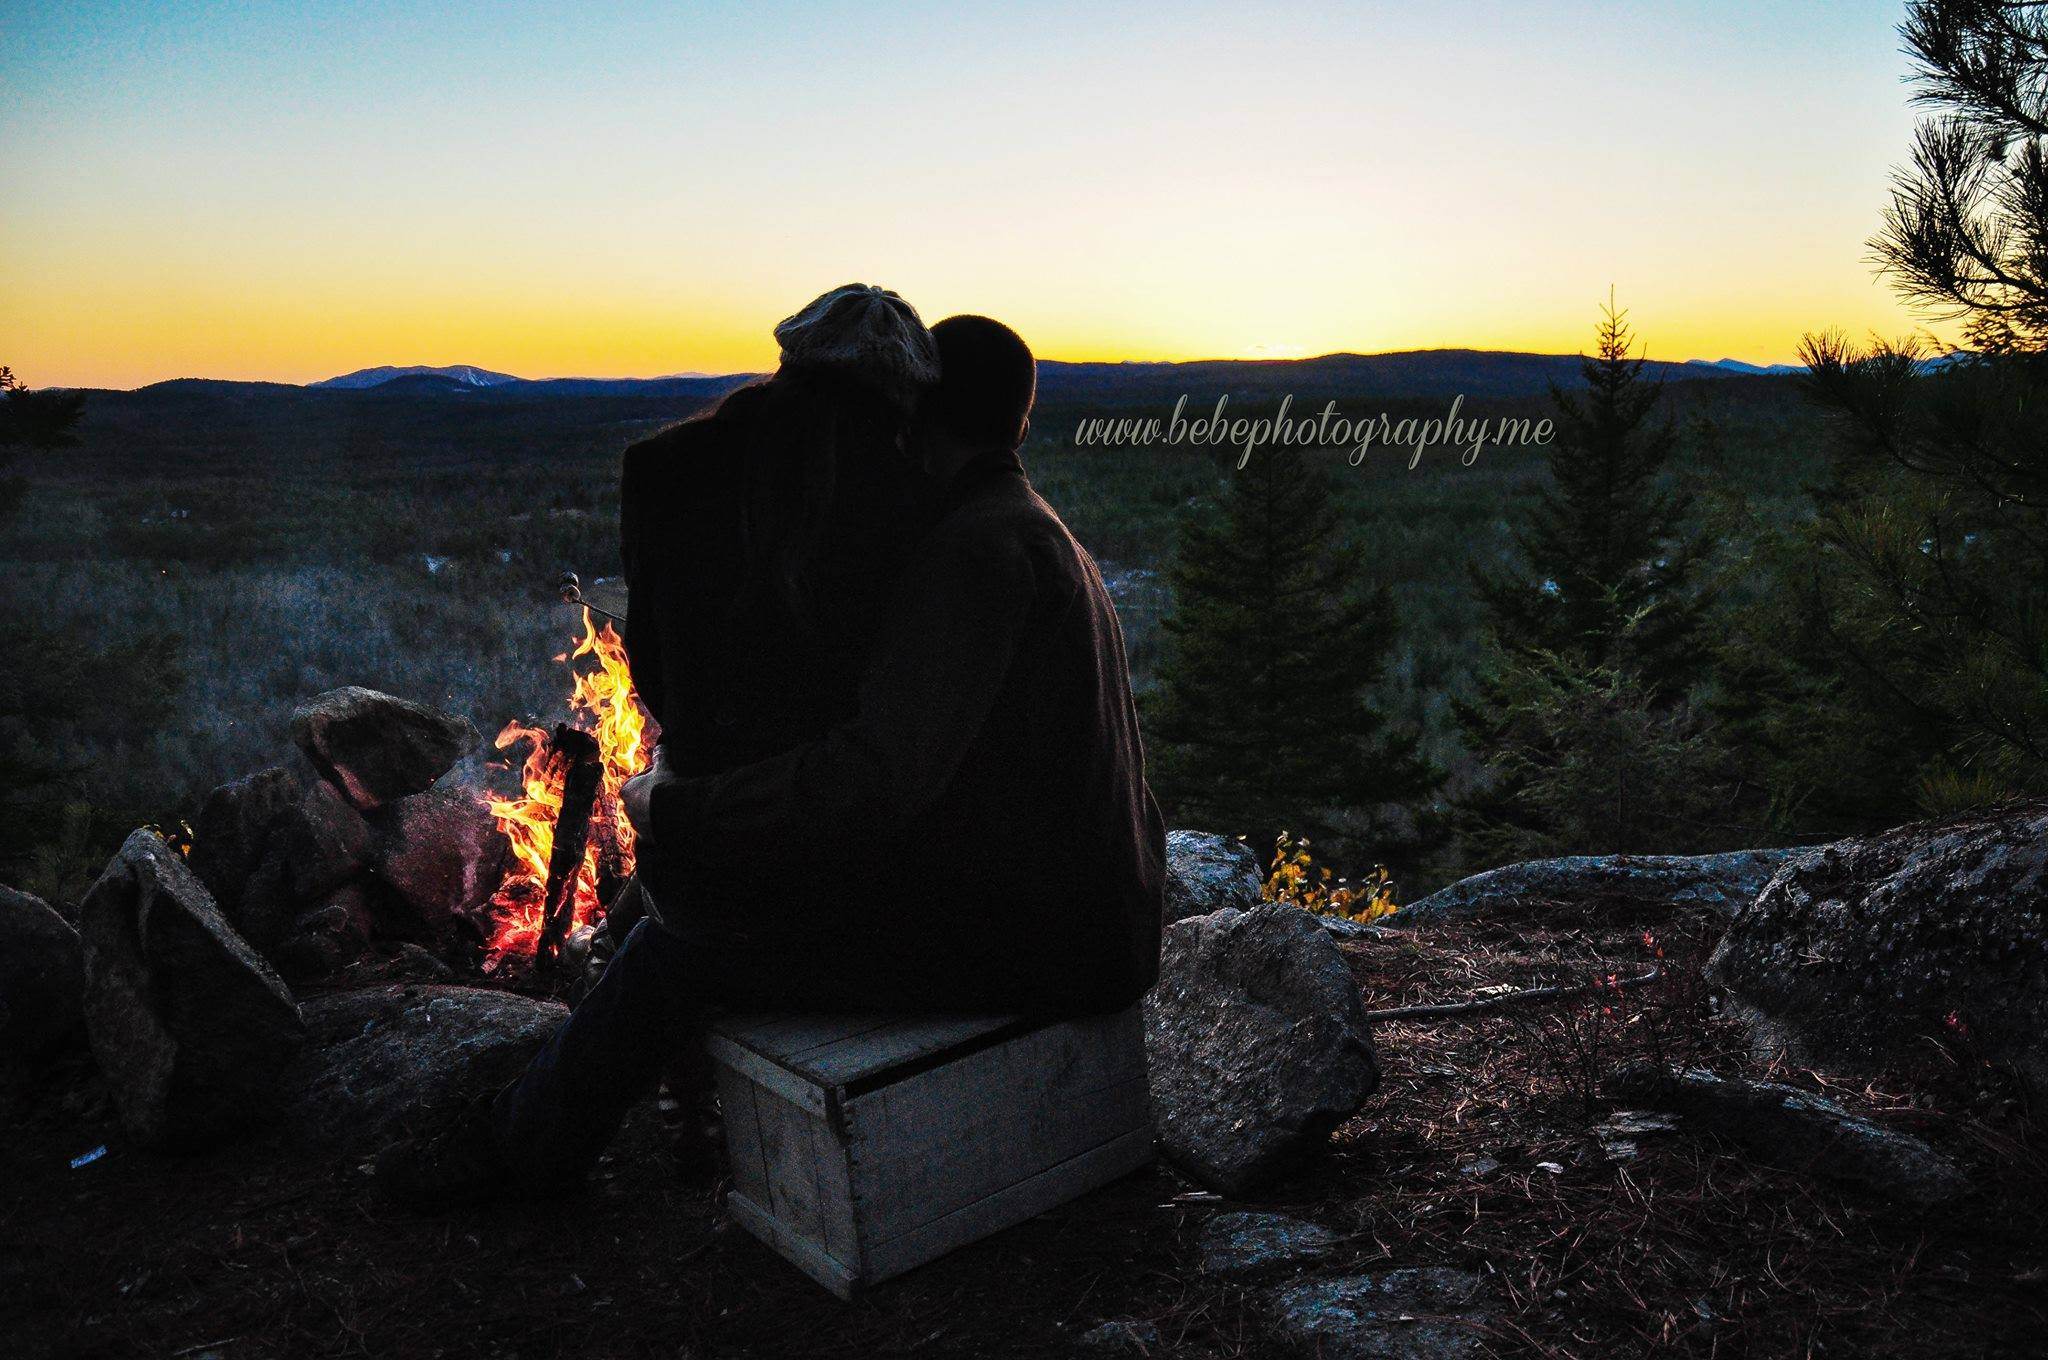 Wedding Venue In Maine